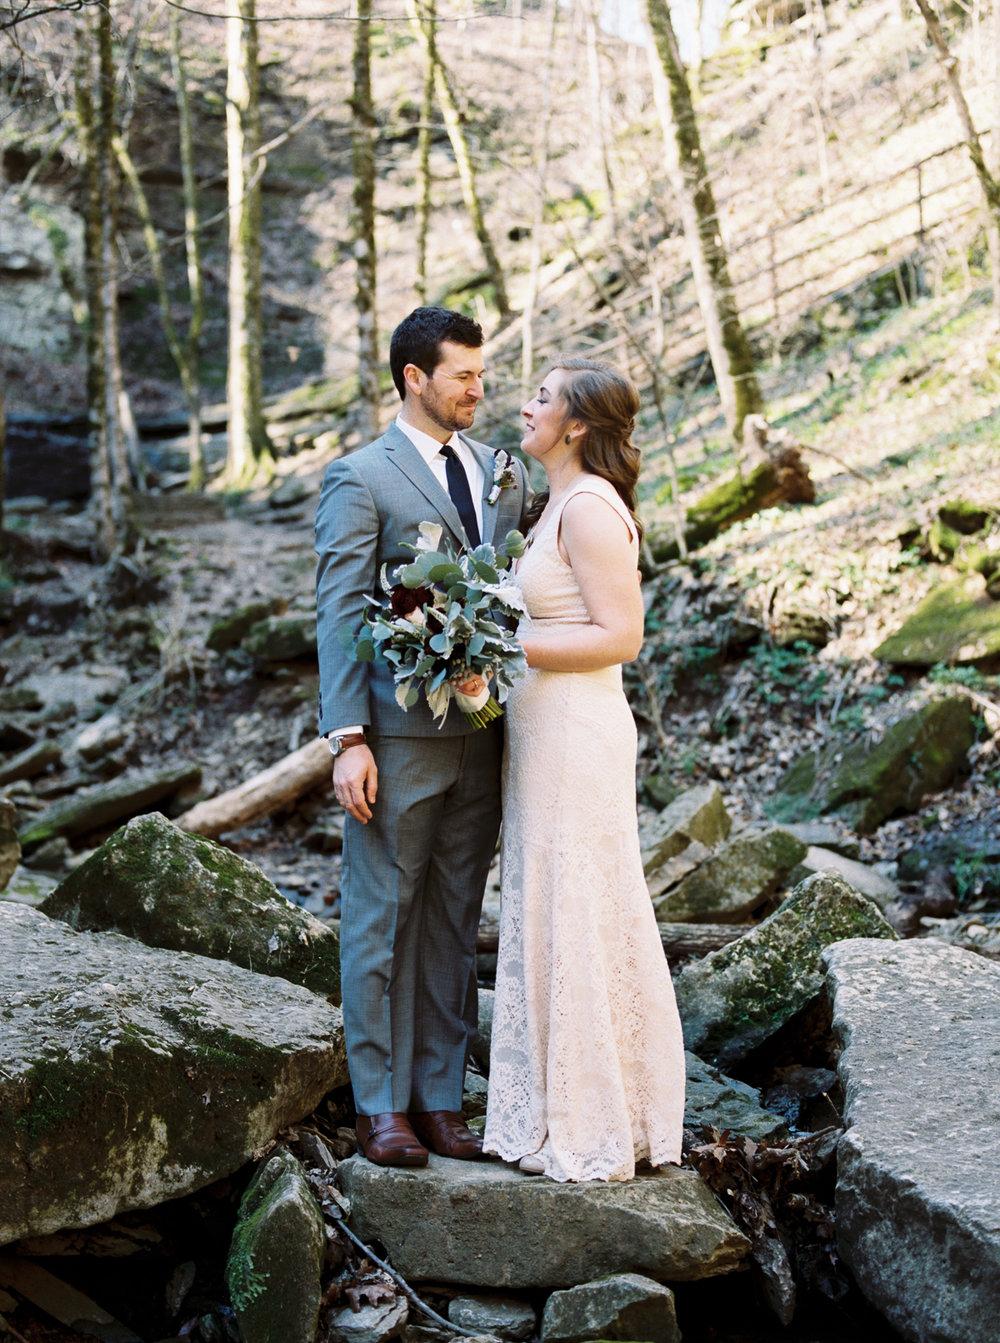 laurel+kelly_natchez_trace_grays_on_main_franklin_film_wedding_photographers©2017abigailbobophotography-17.jpg